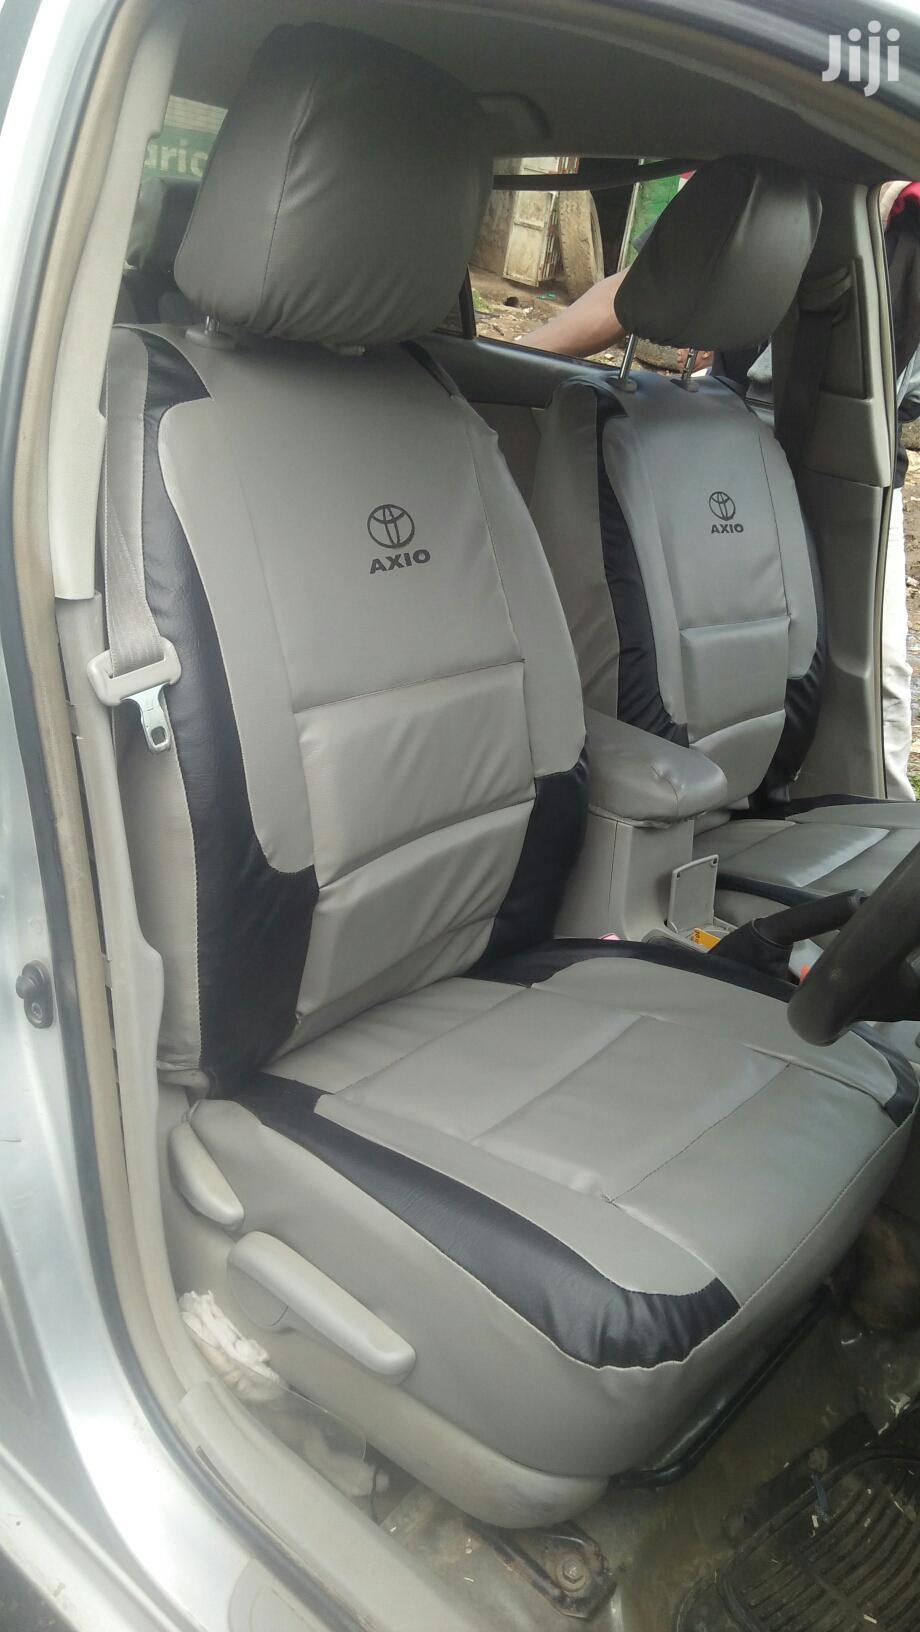 Axio Car Seat Covers